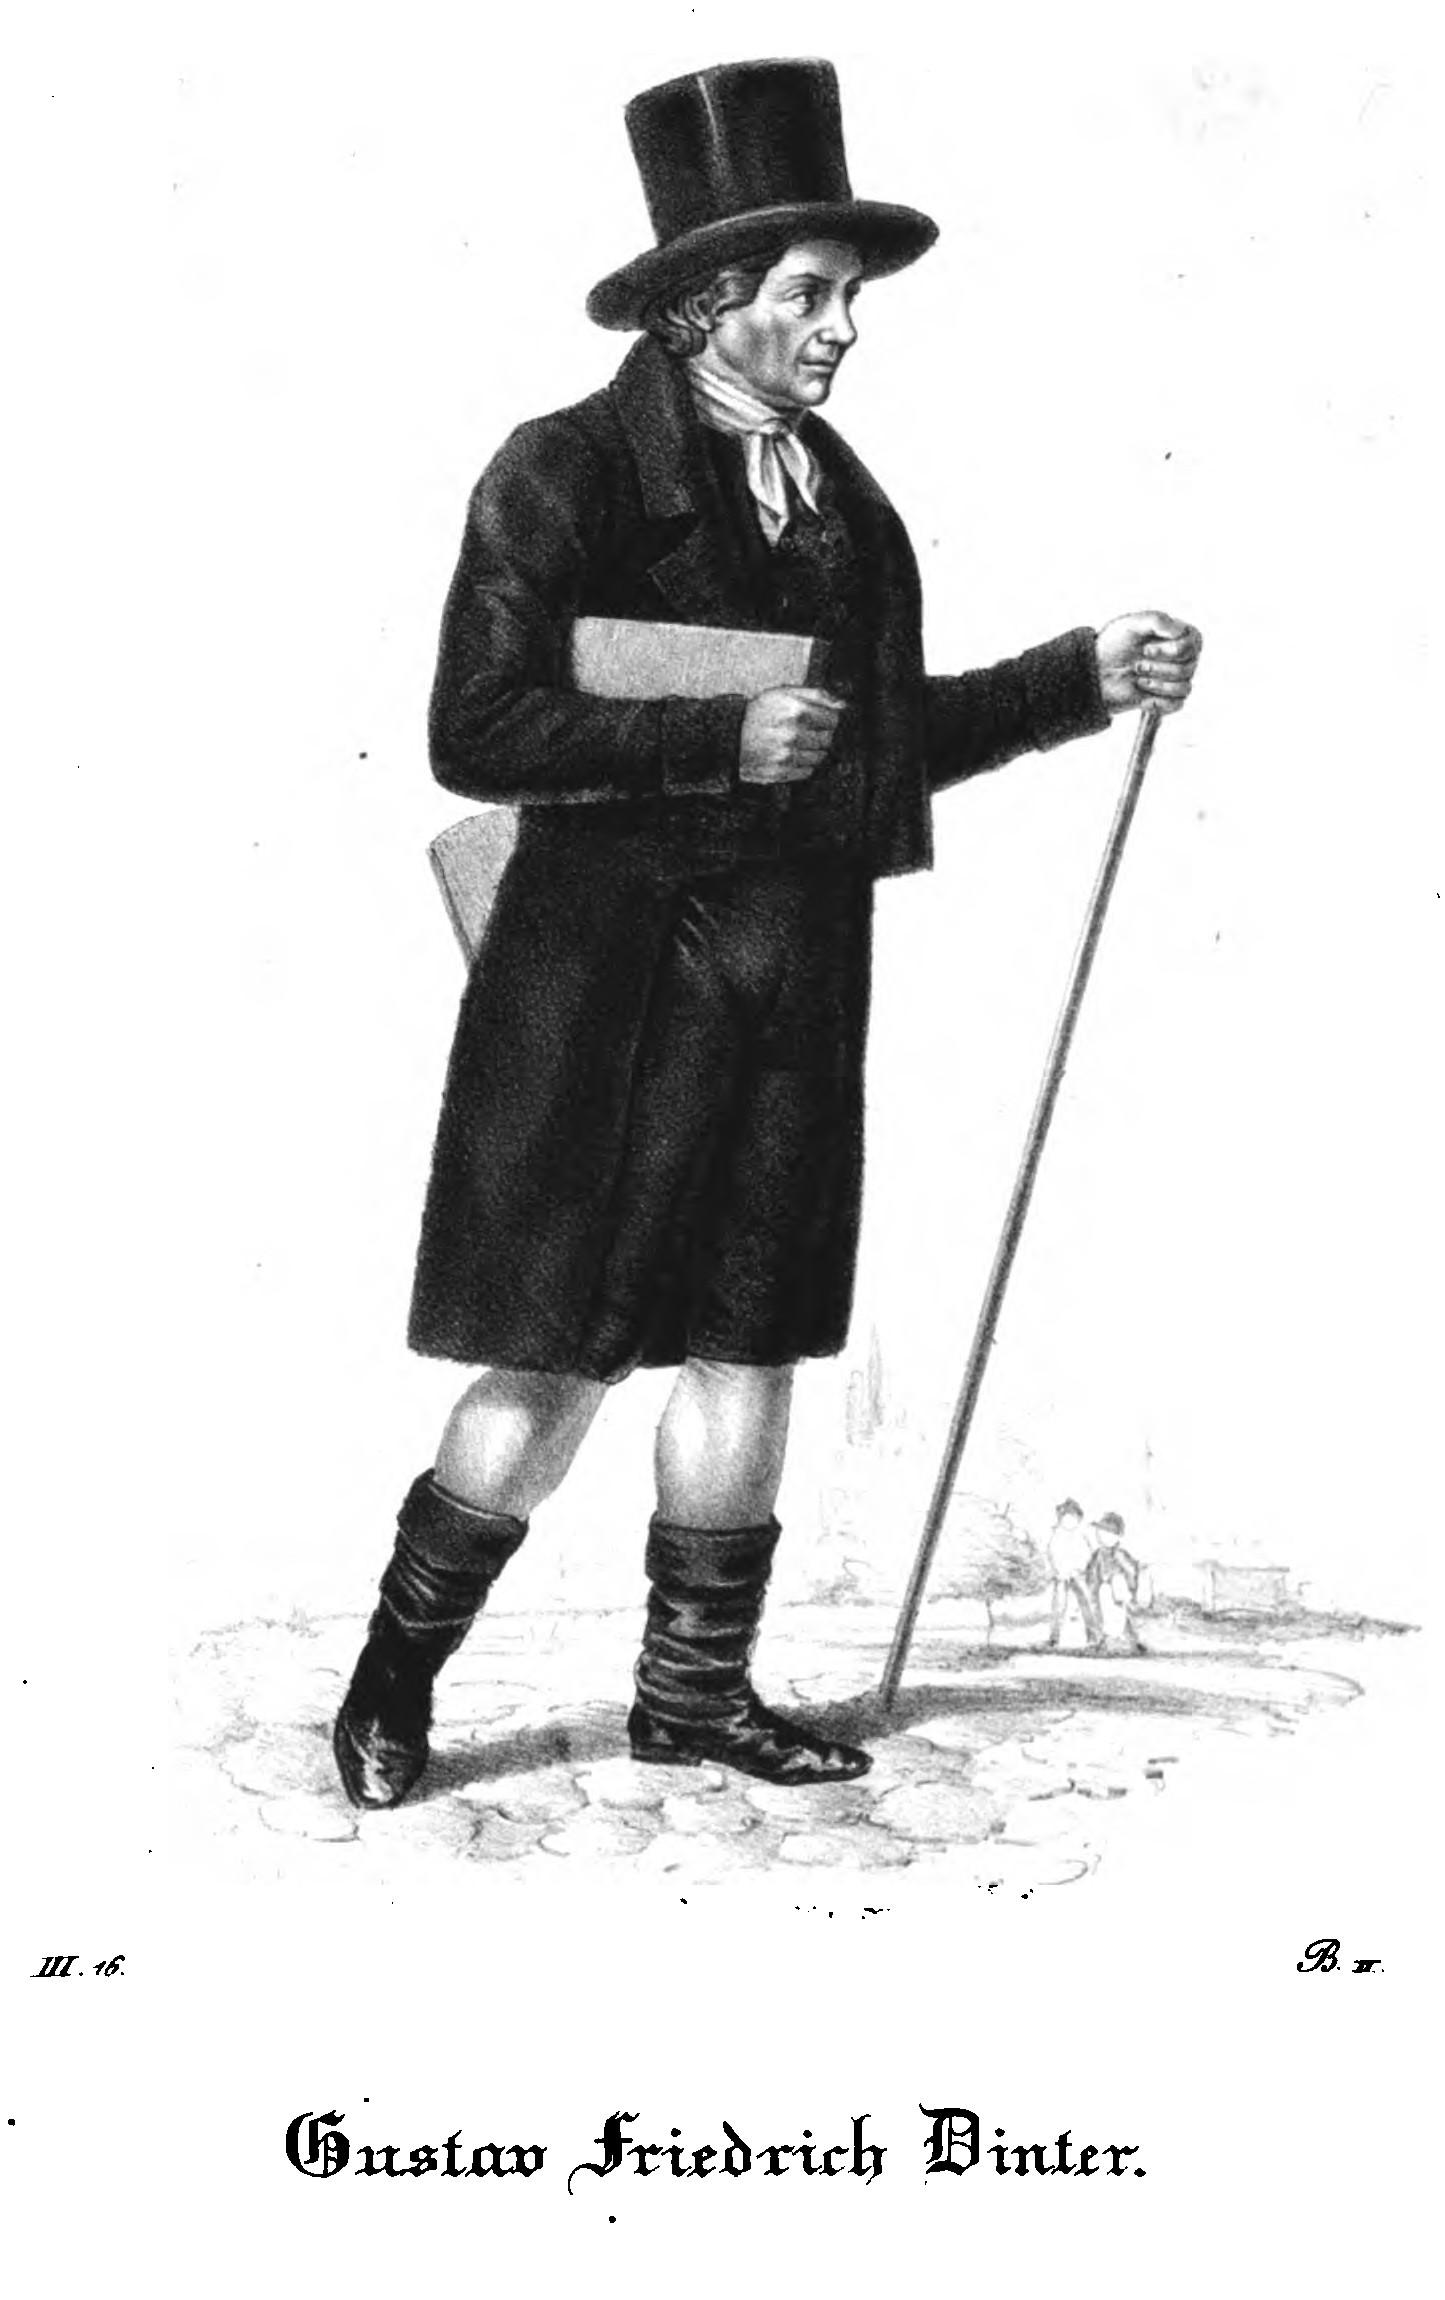 Lithograph, 1837